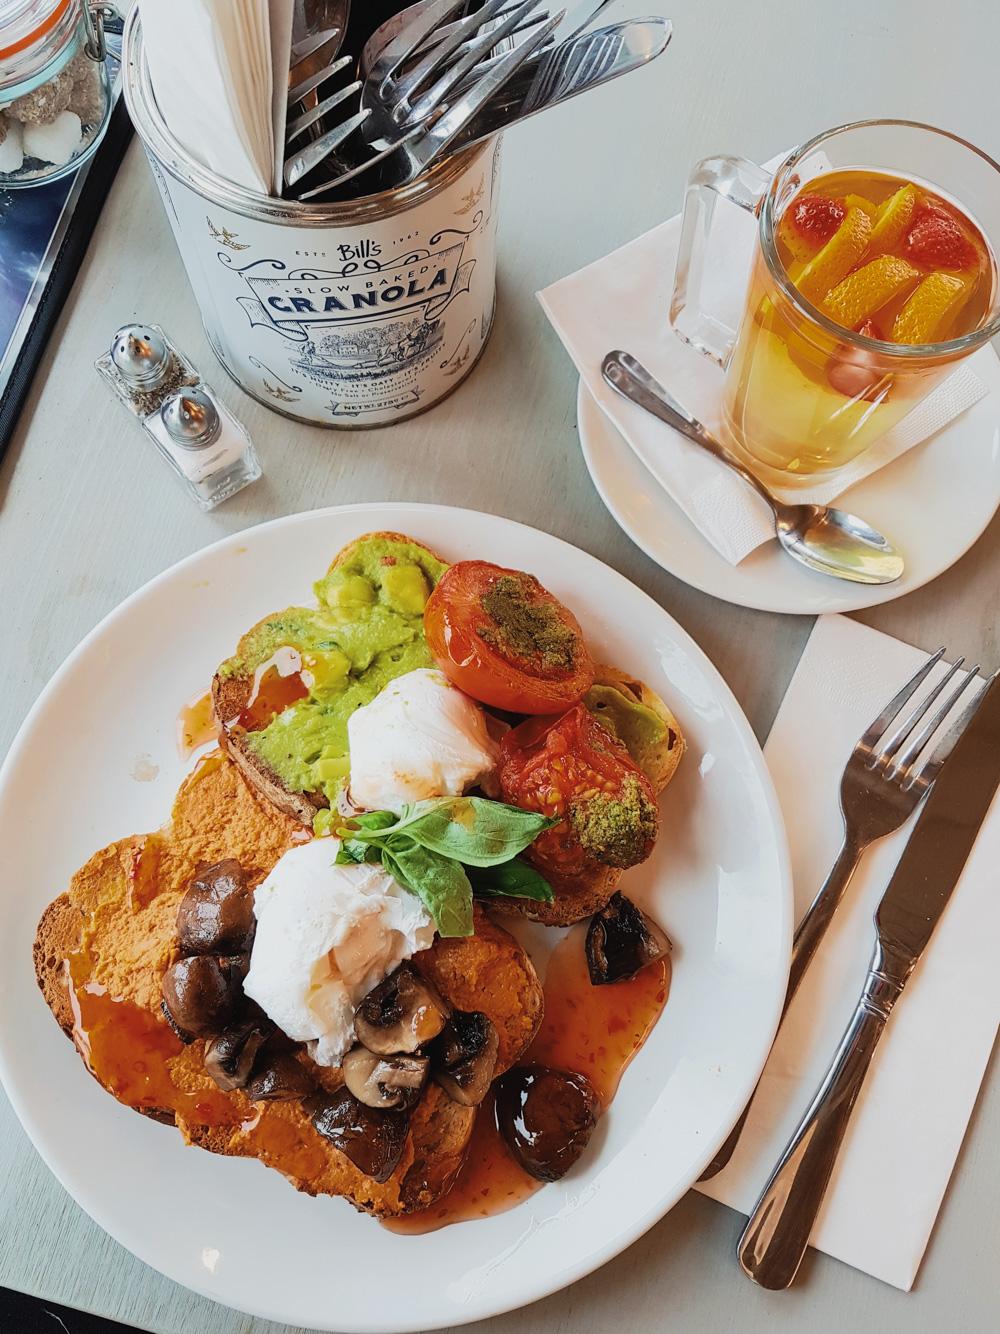 Bills Vegetarian Breakfast